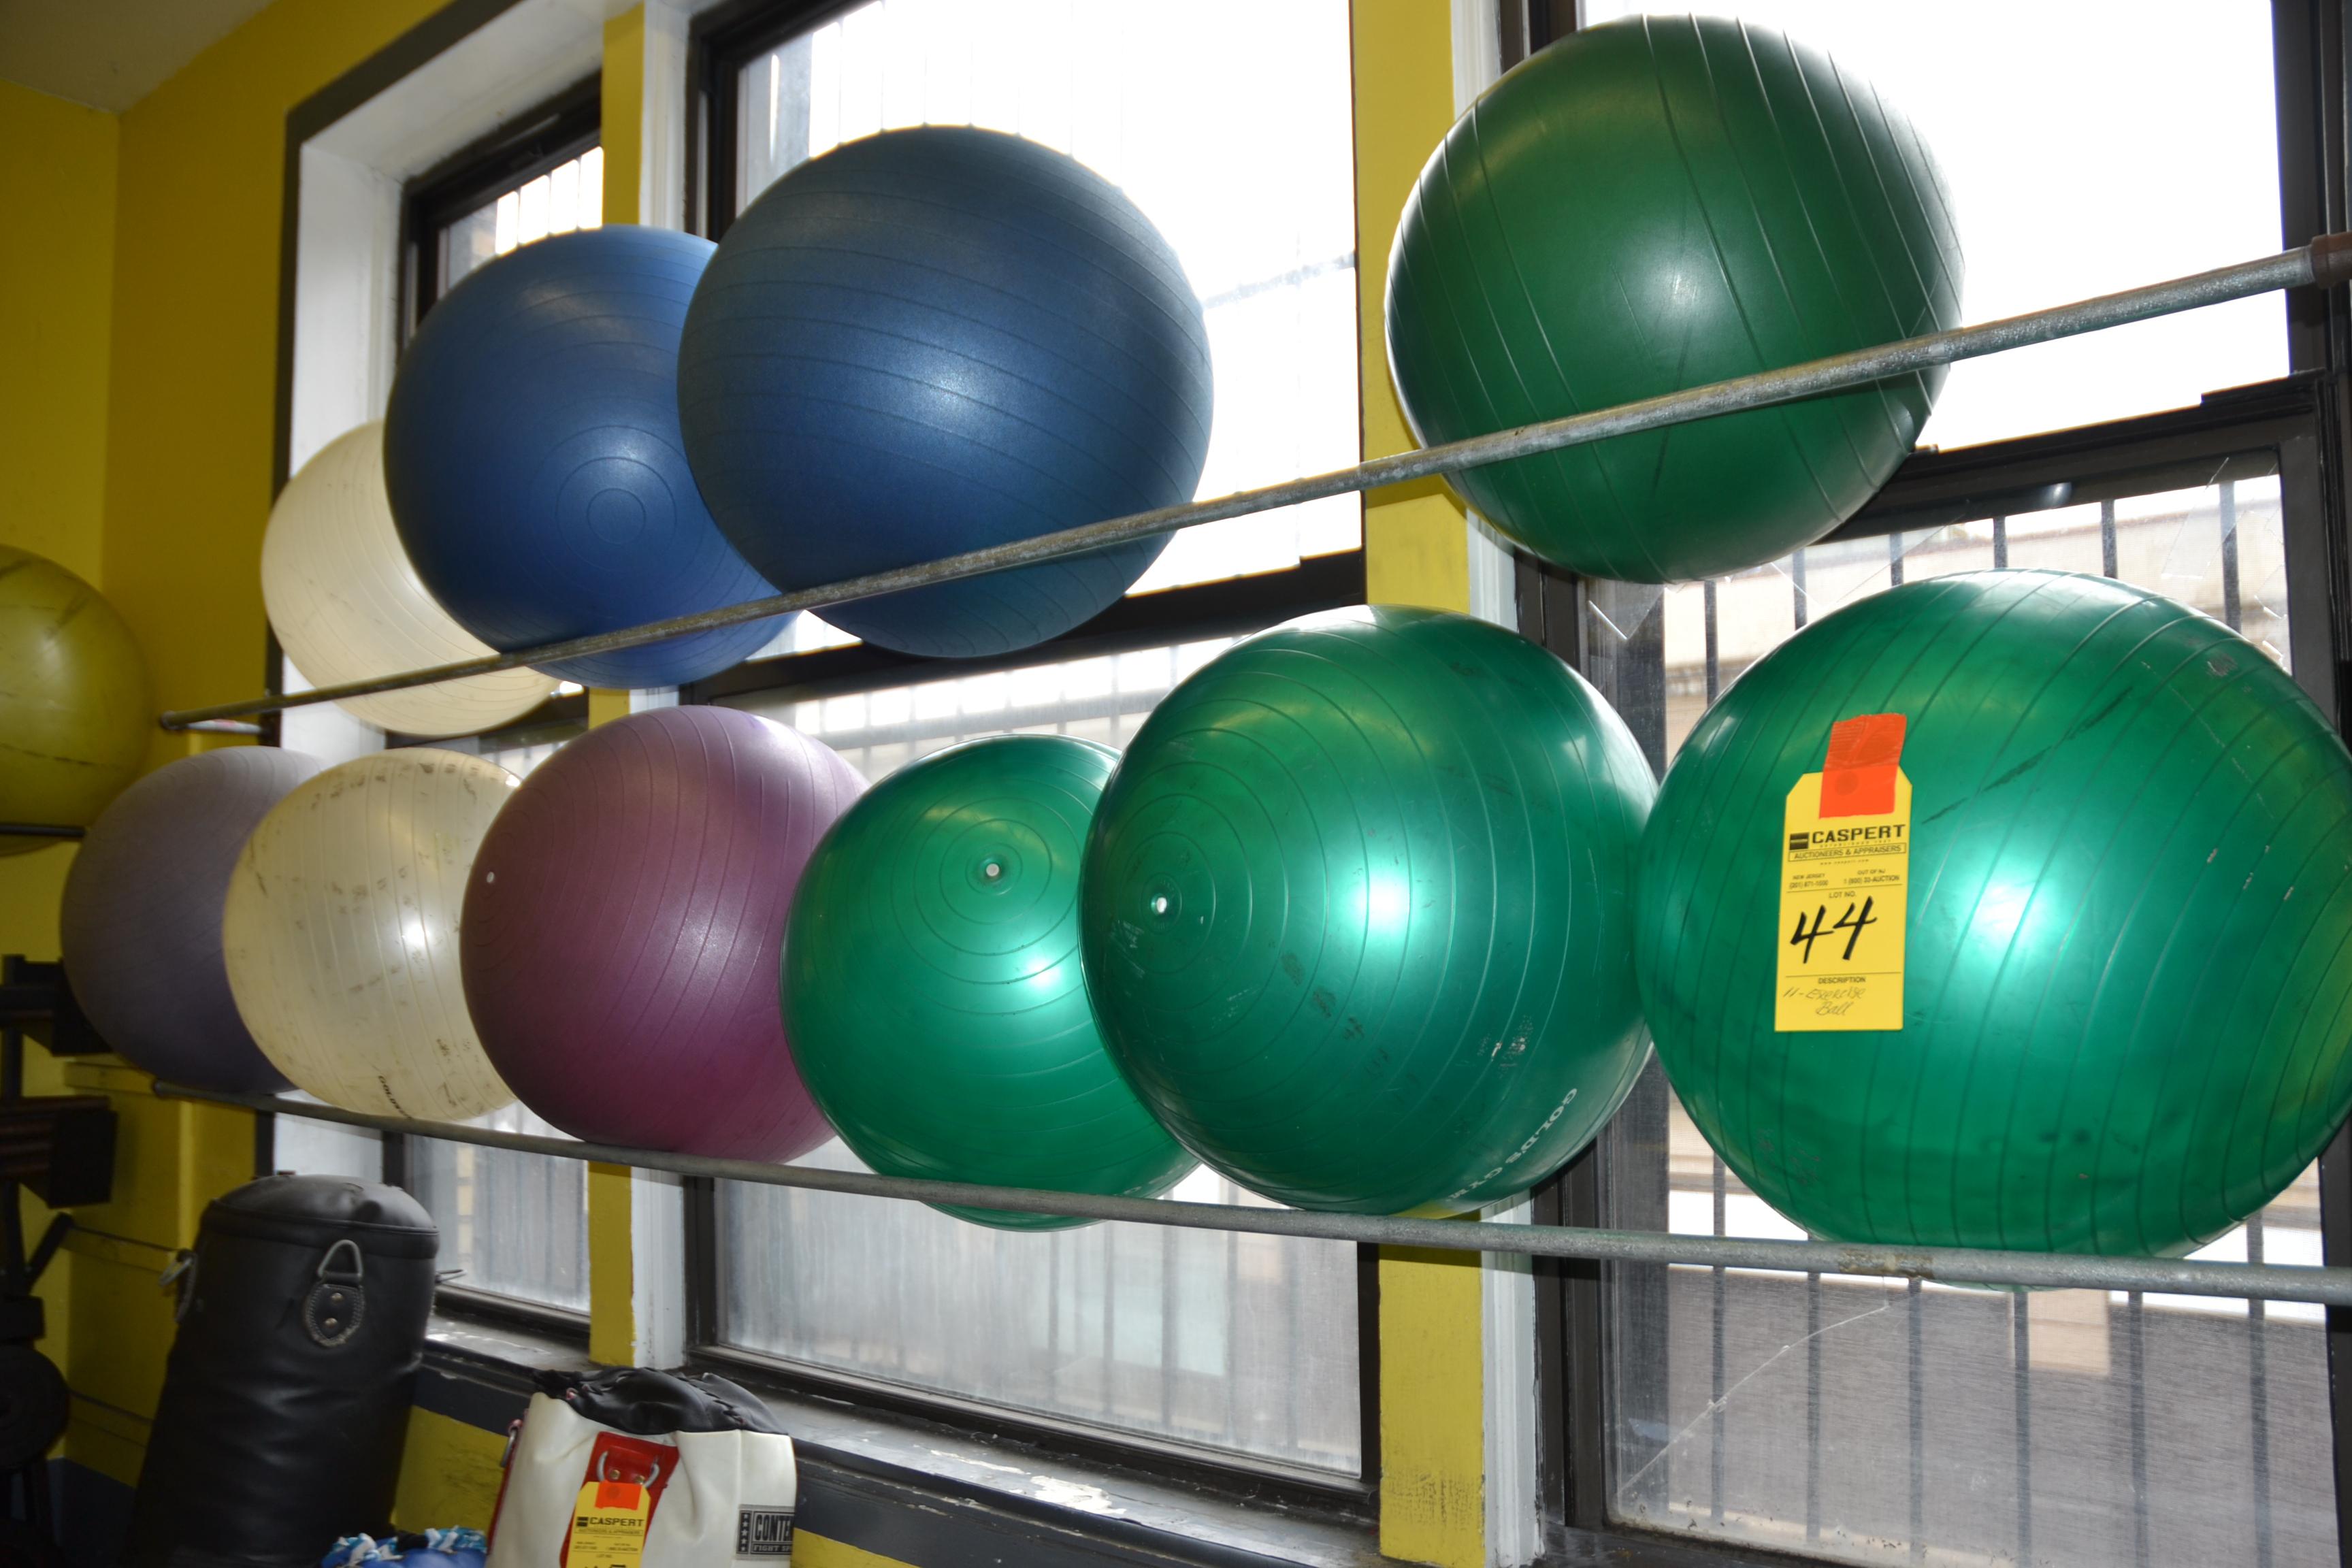 Lot 44 - EXERCISE BALLS